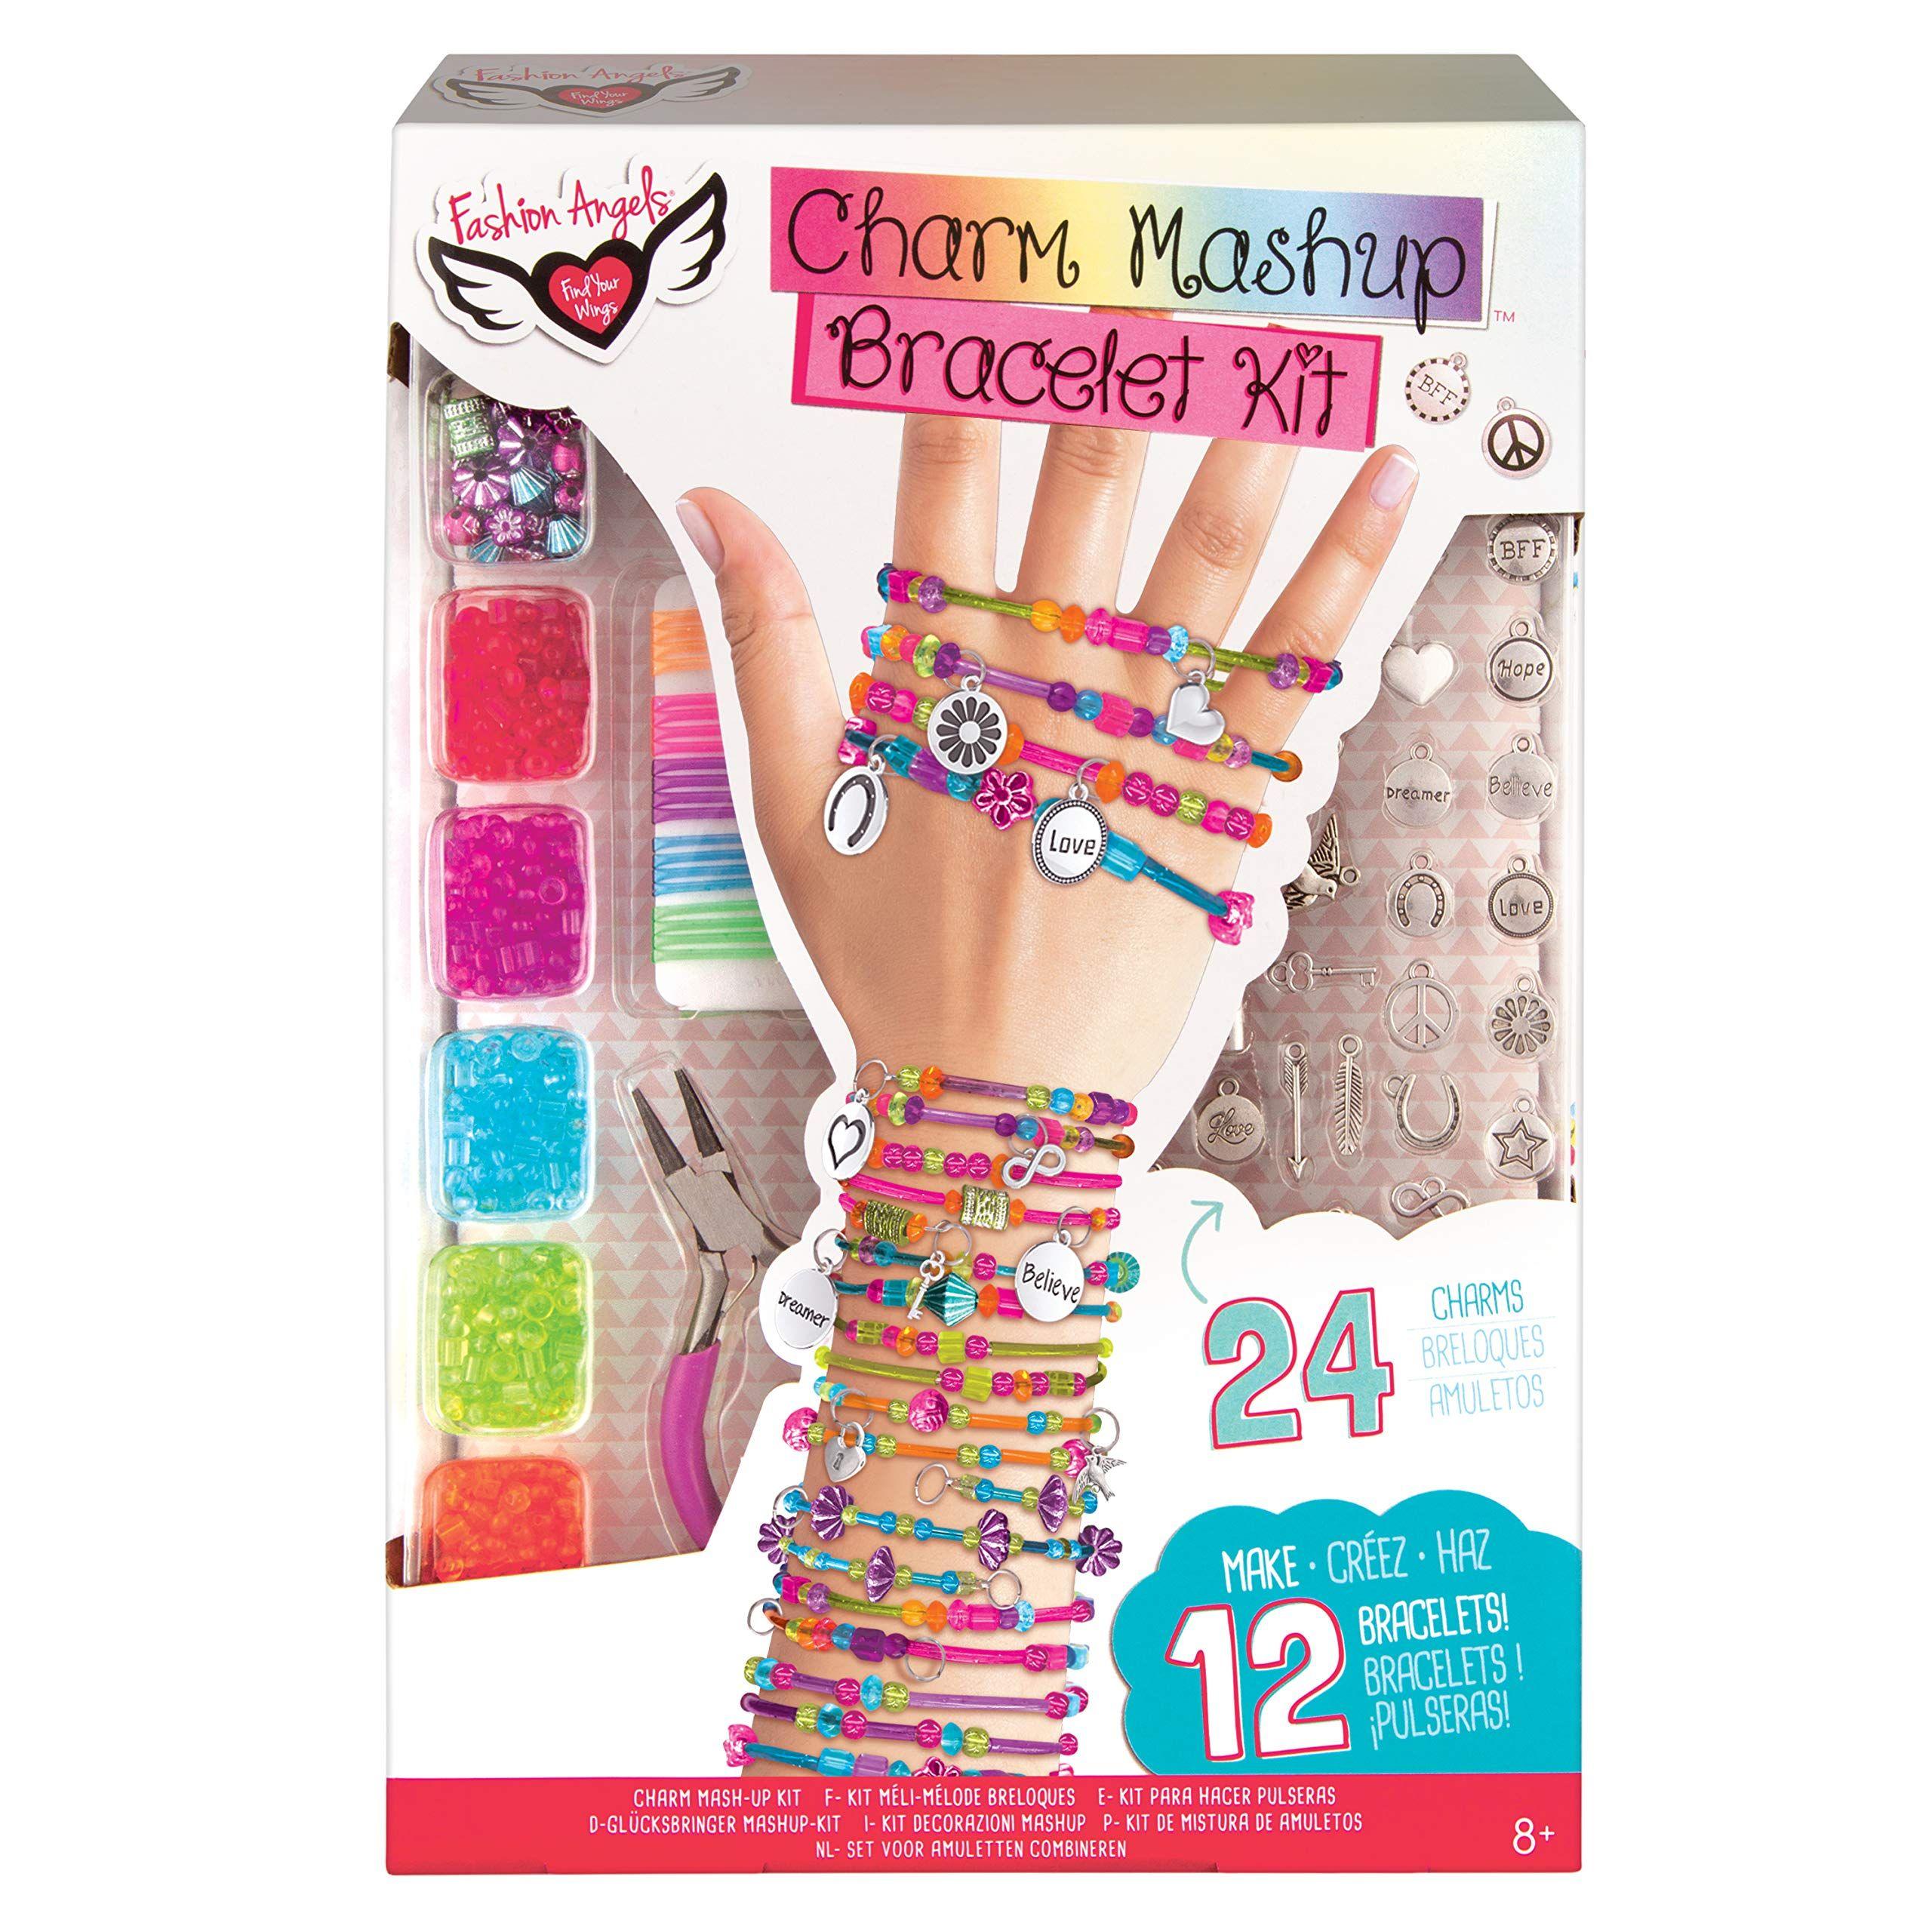 Jewelry Charms MY SCRAP BOOK 12 Bracelets New Craft